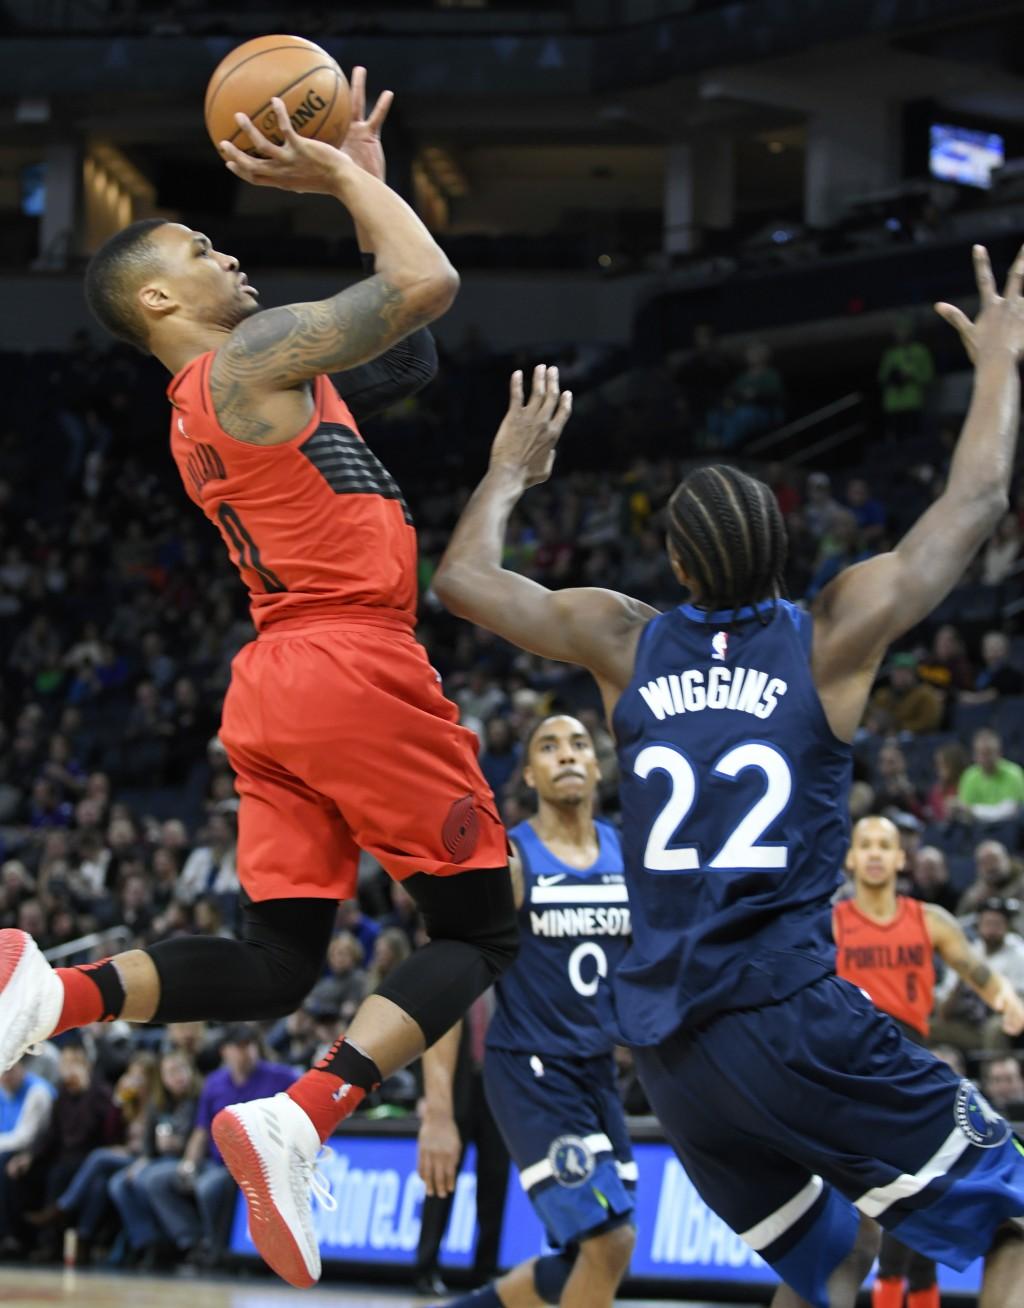 Portland Trail Blazers' Damian Lillard, left, shoots over Minnesota Timberwolves' Andrew Wiggins (22) in the first quarter of an NBA basketball game S...